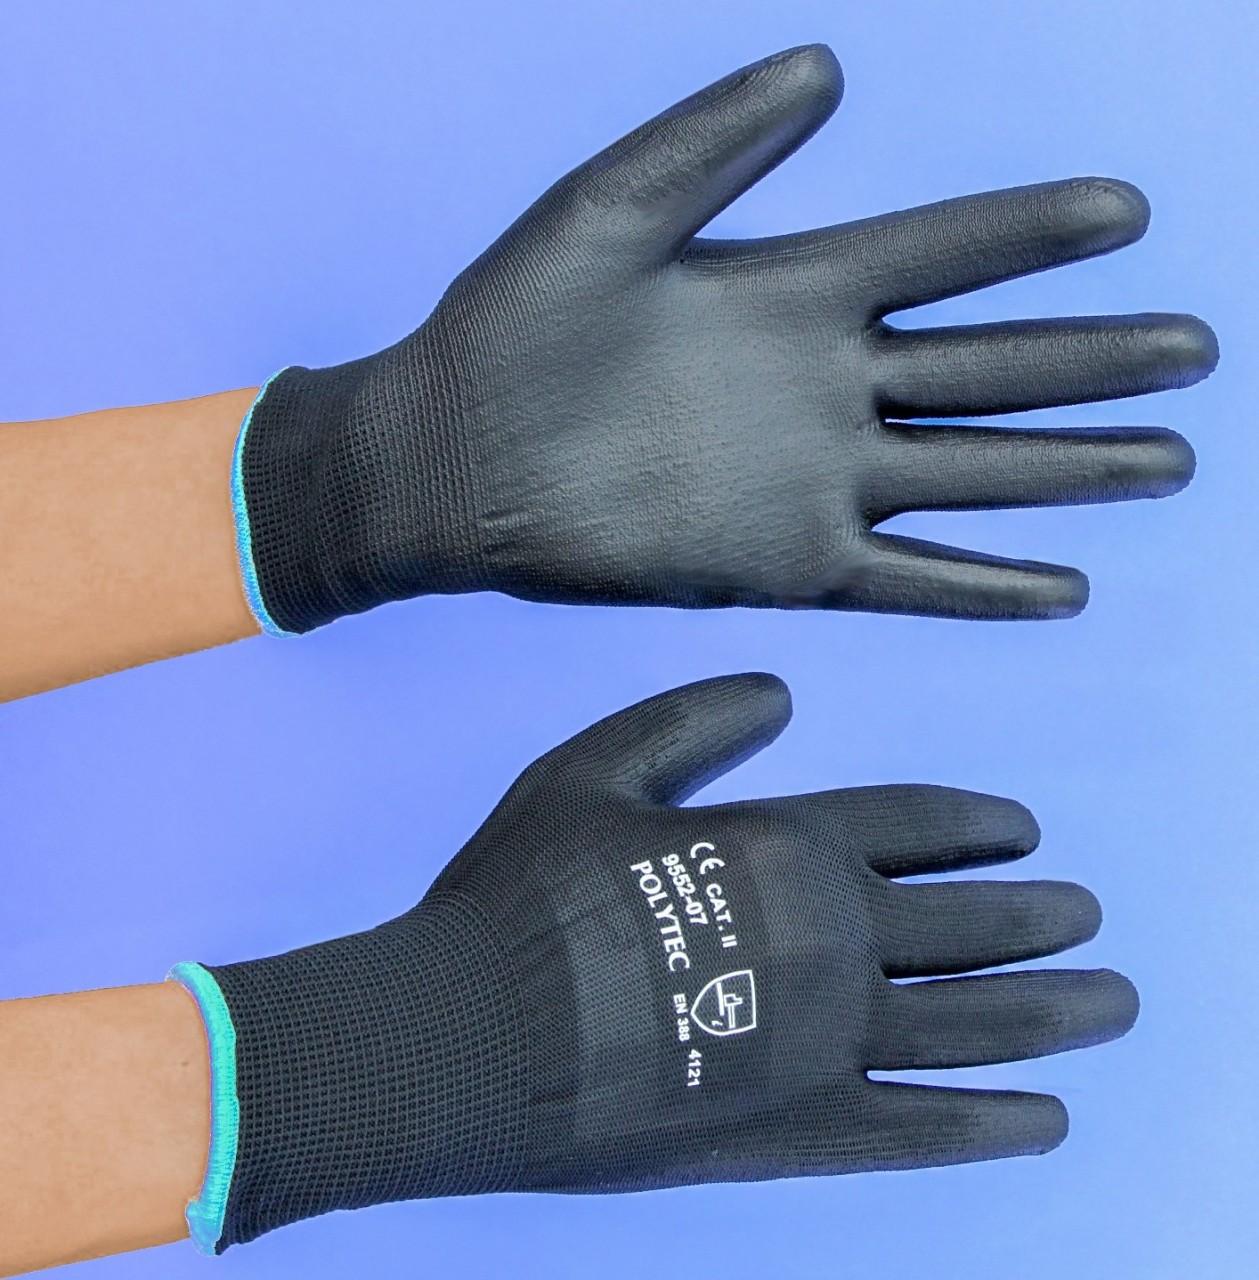 Schutzhandschuhe |POLYTEC schwarz